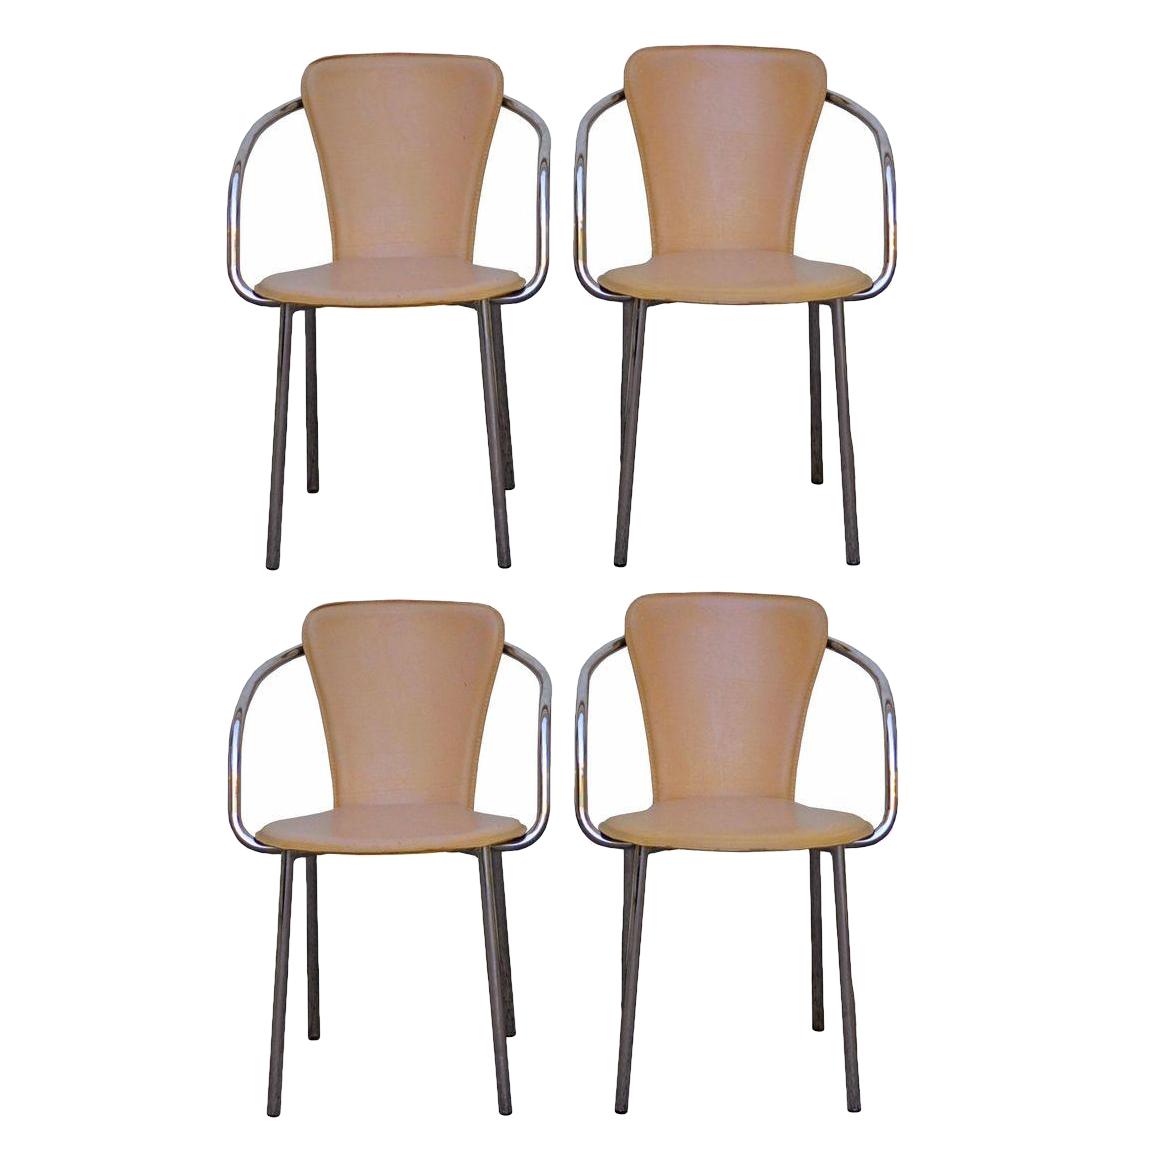 Italian Chrome Leather Dining Chairs Set Of 4 Chairish